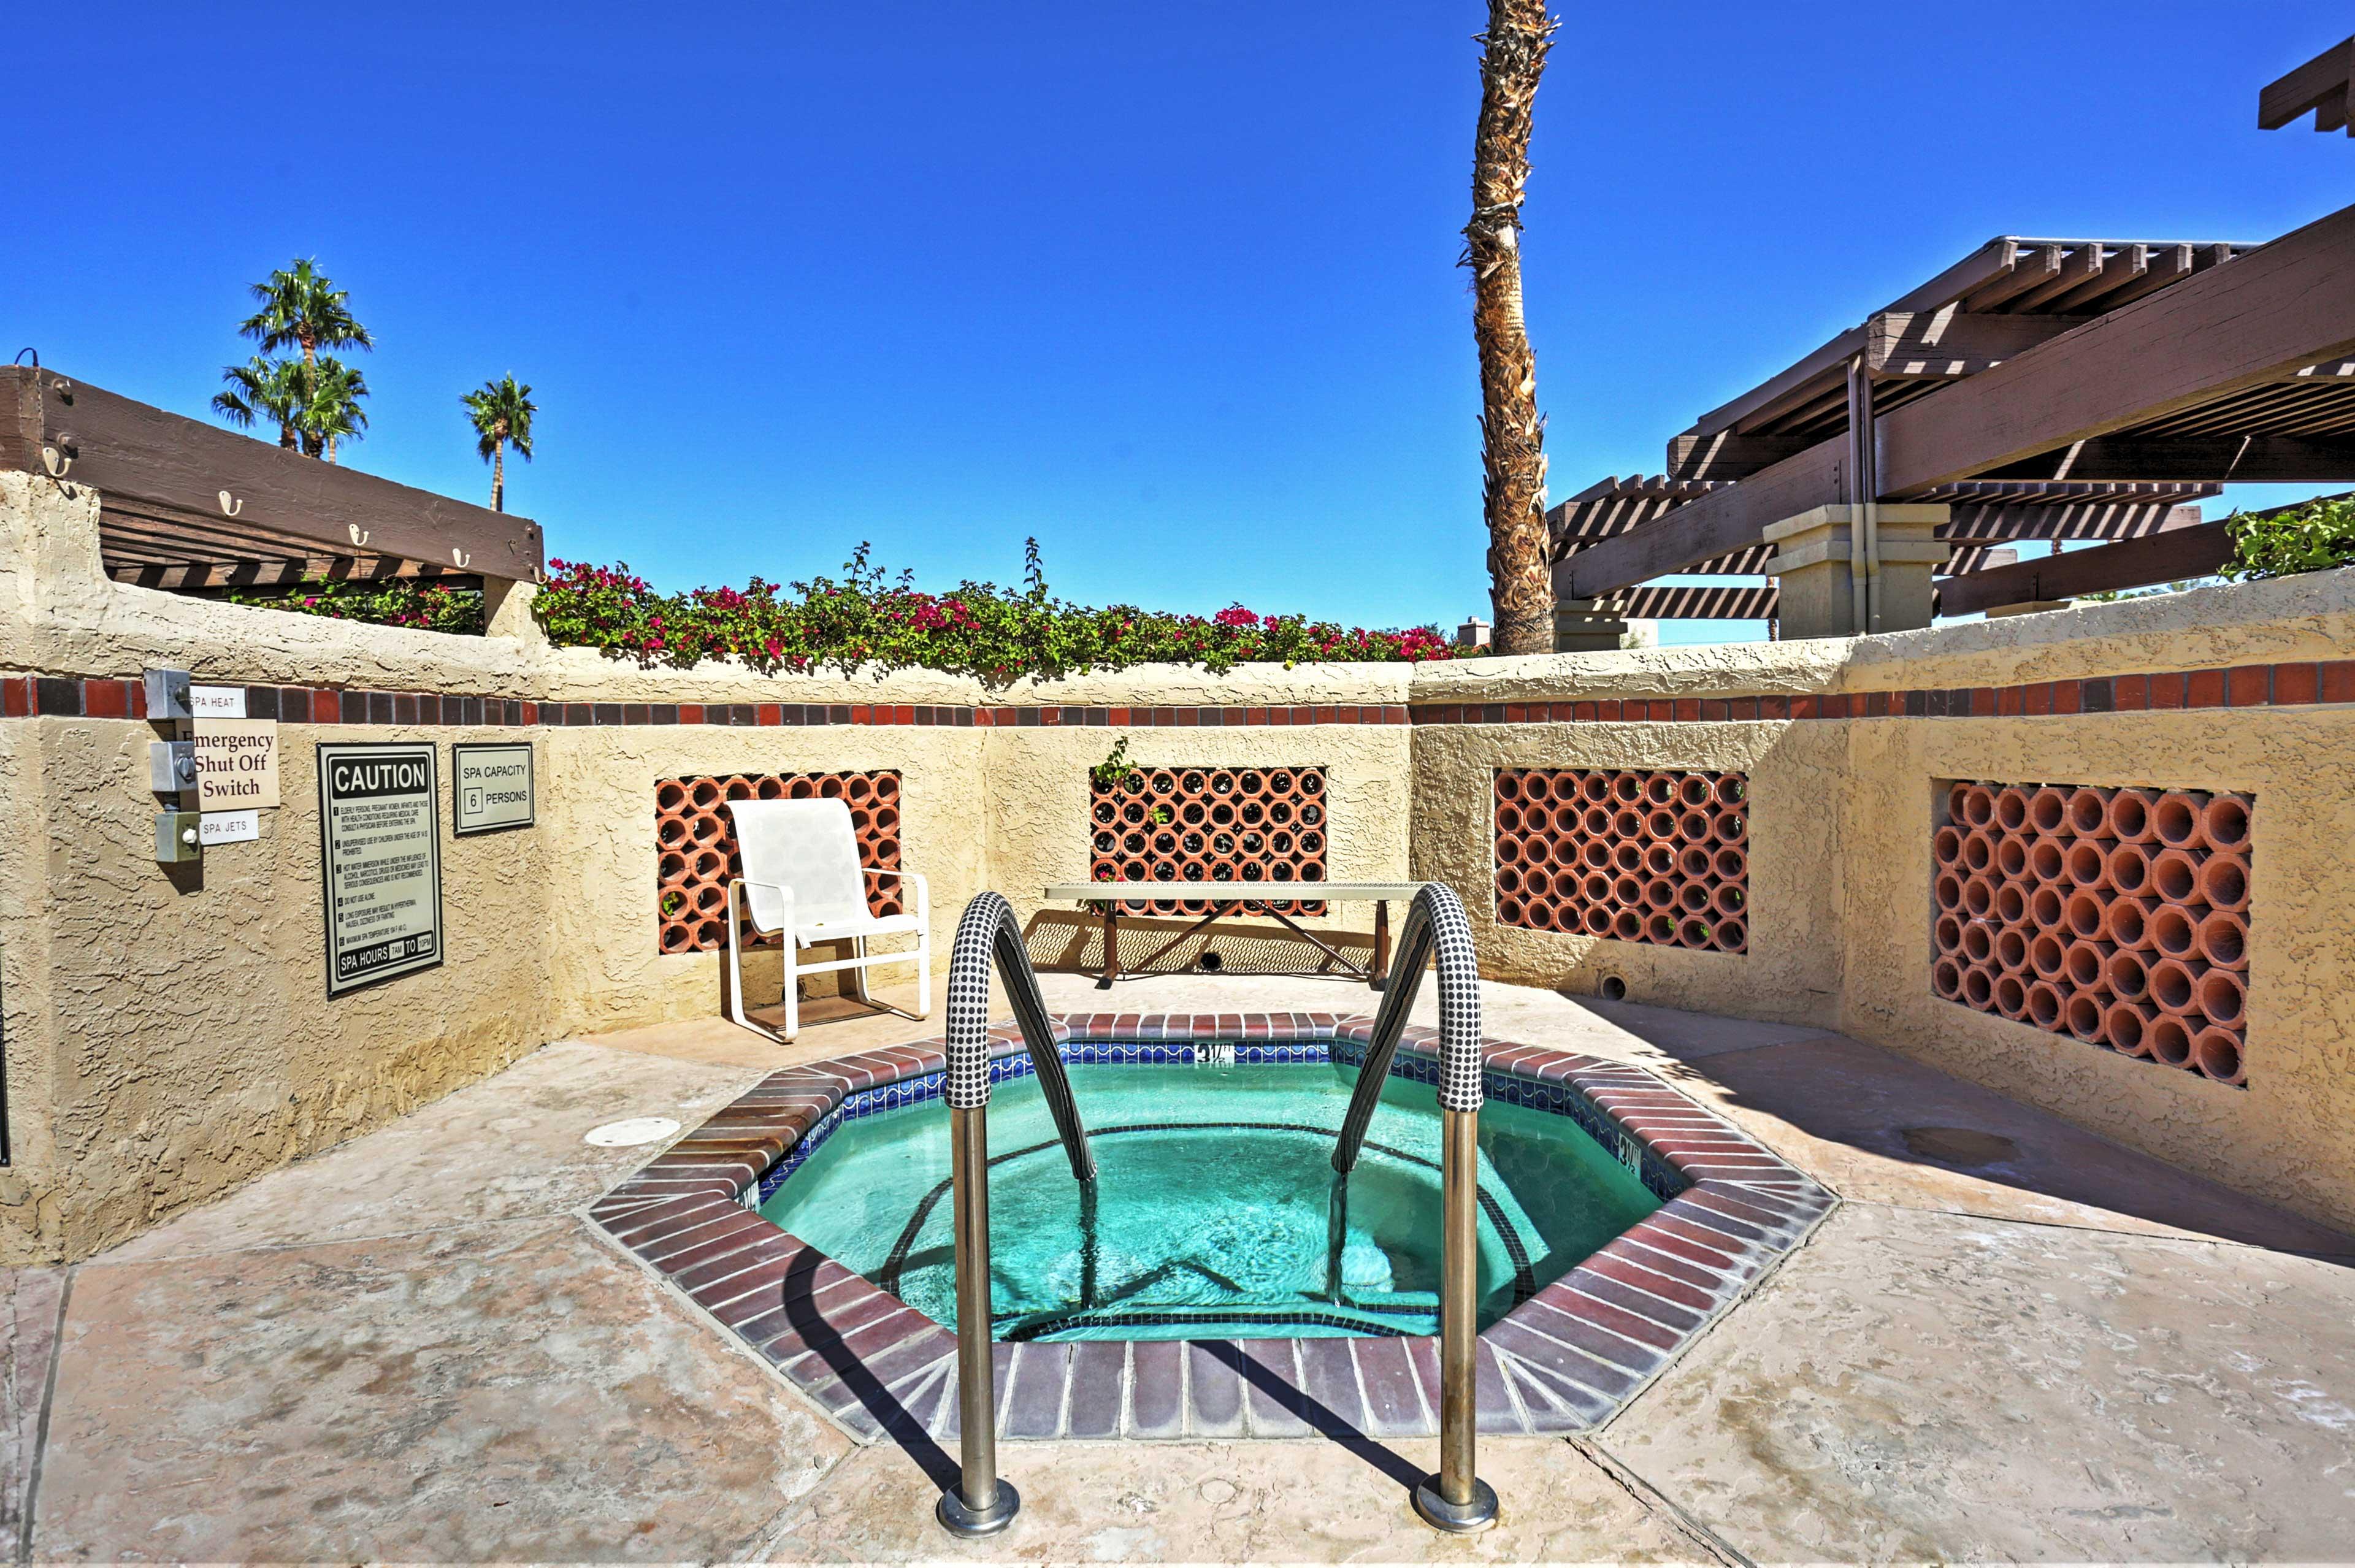 Take a dip in the quaint community hot tub.